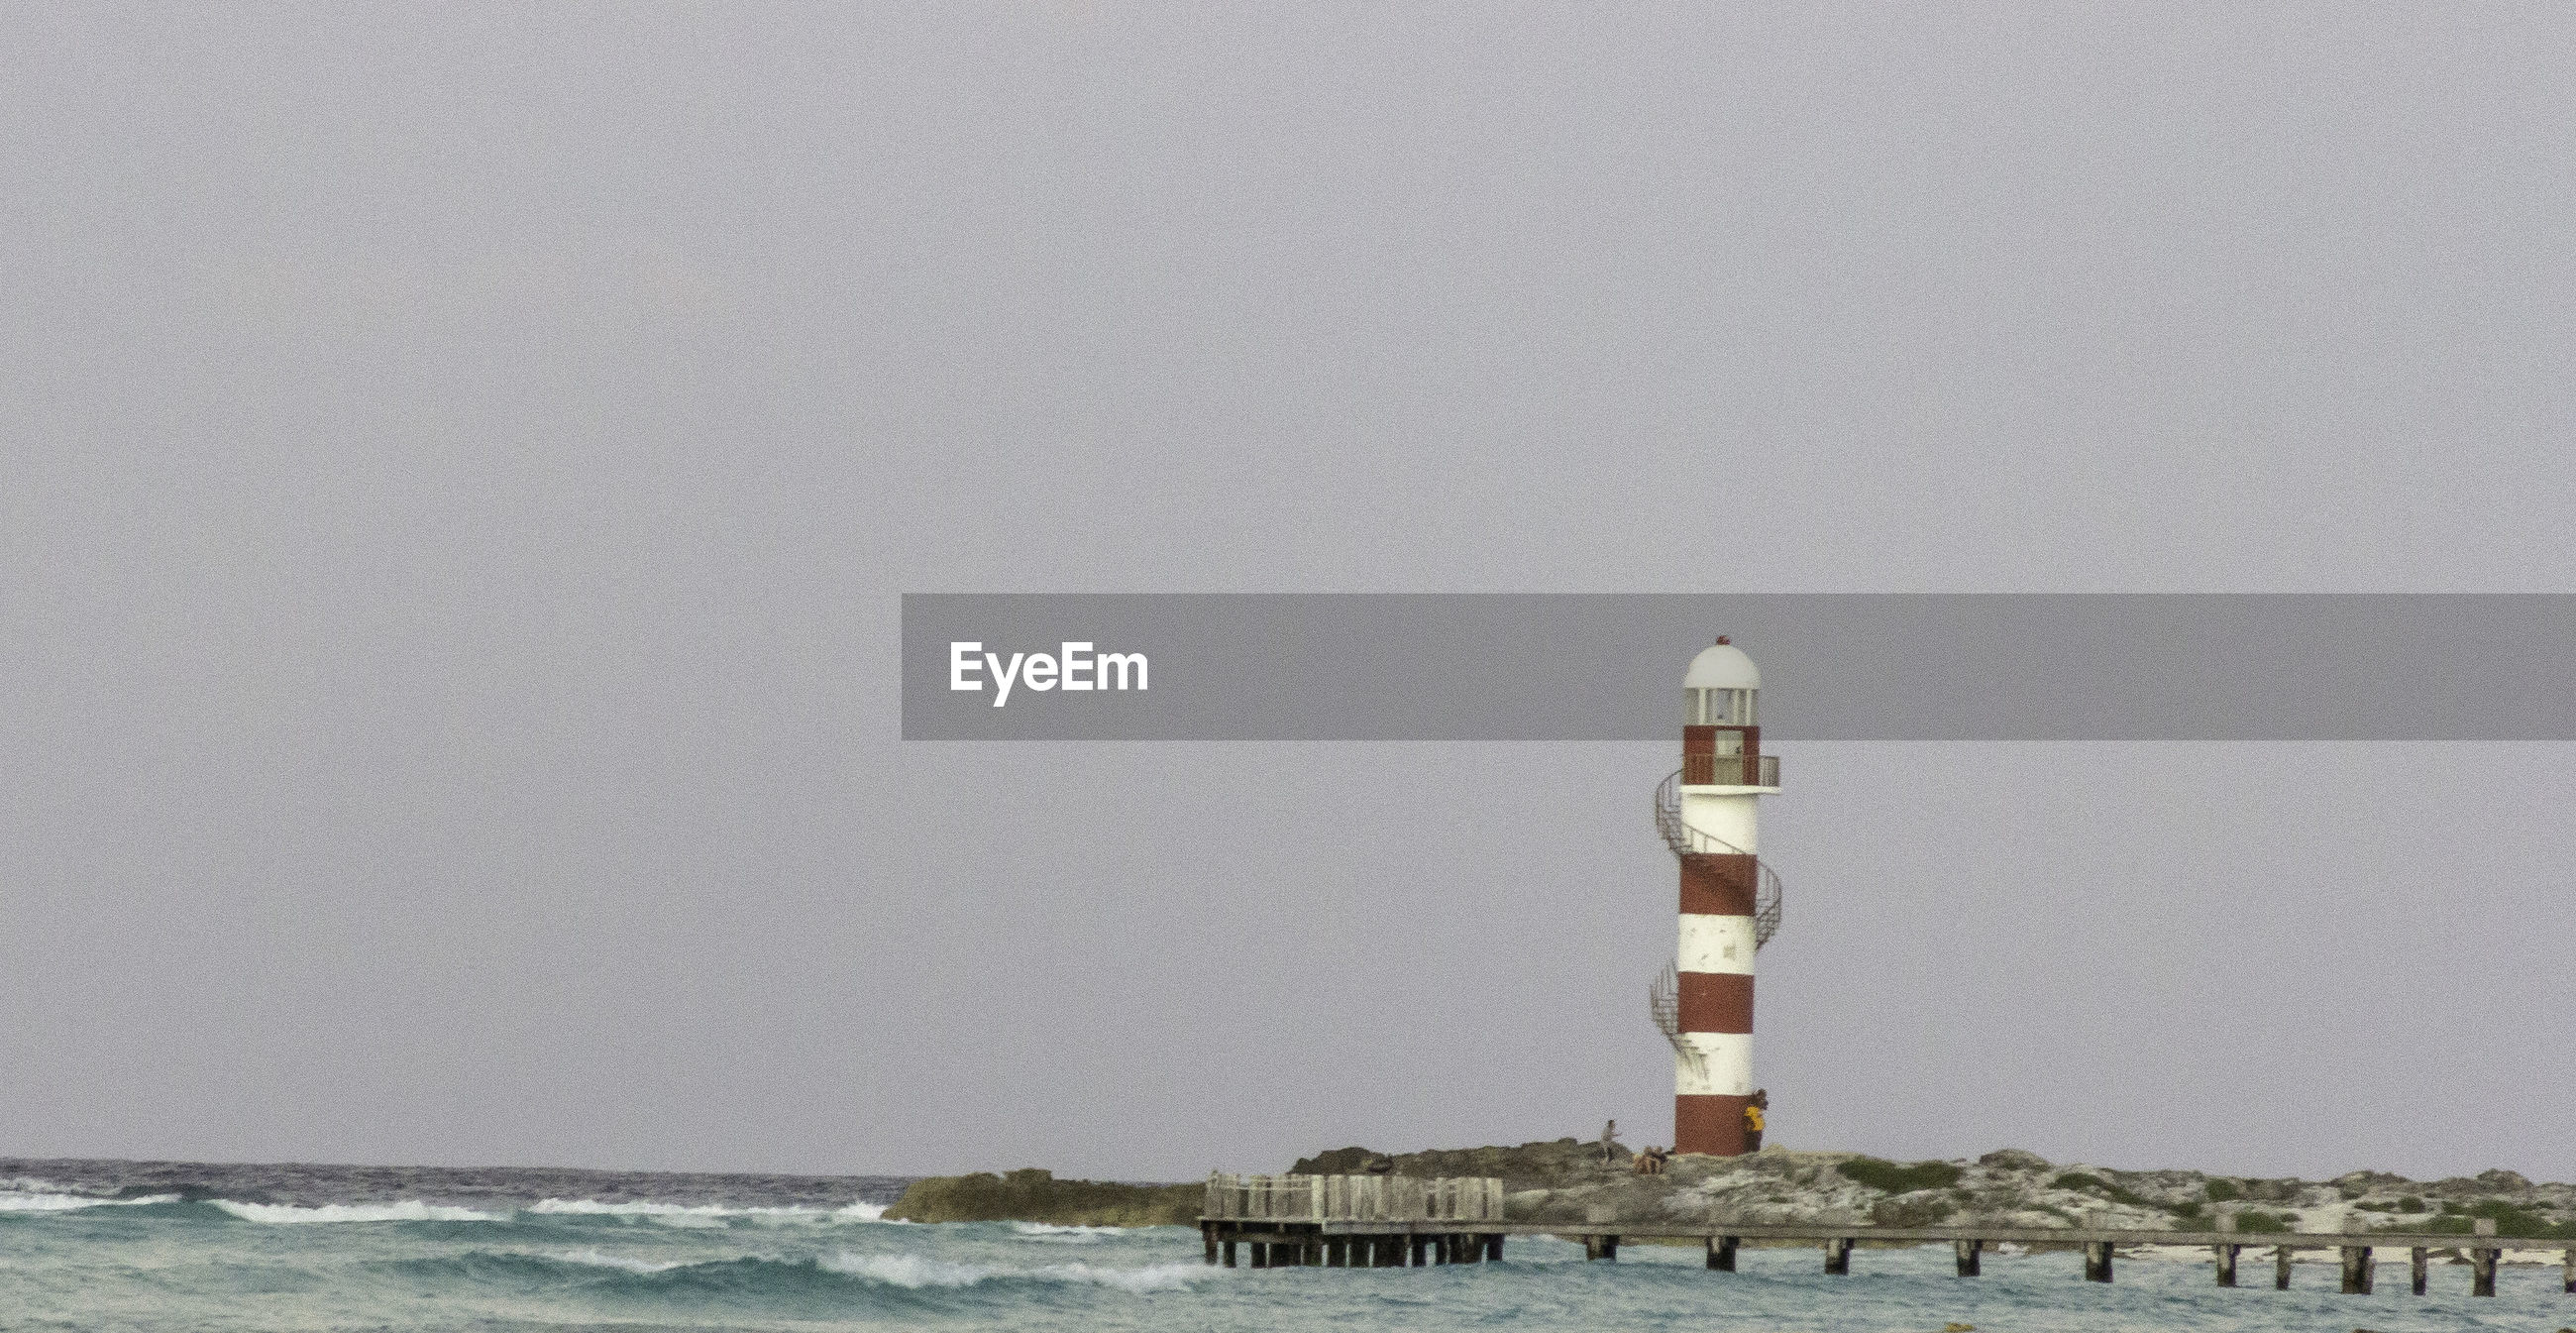 Lighthouse by sea against clear sky | ID: 139867101